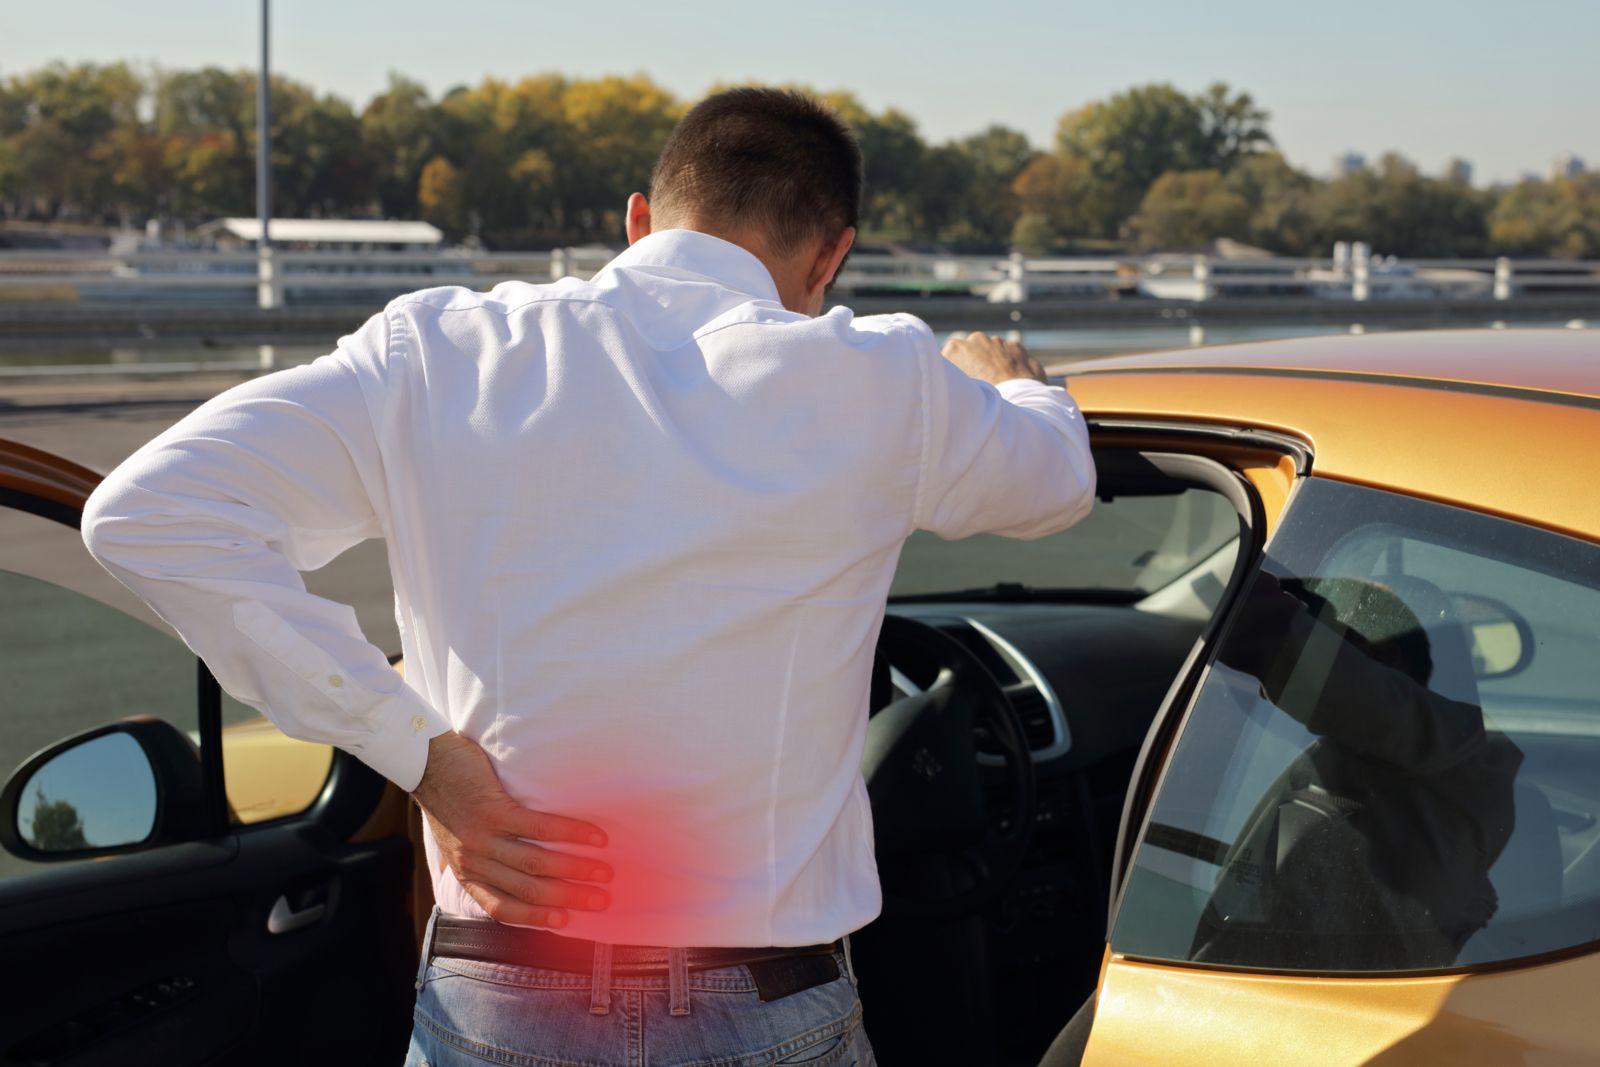 Man Holding Lower Back Outside of Car